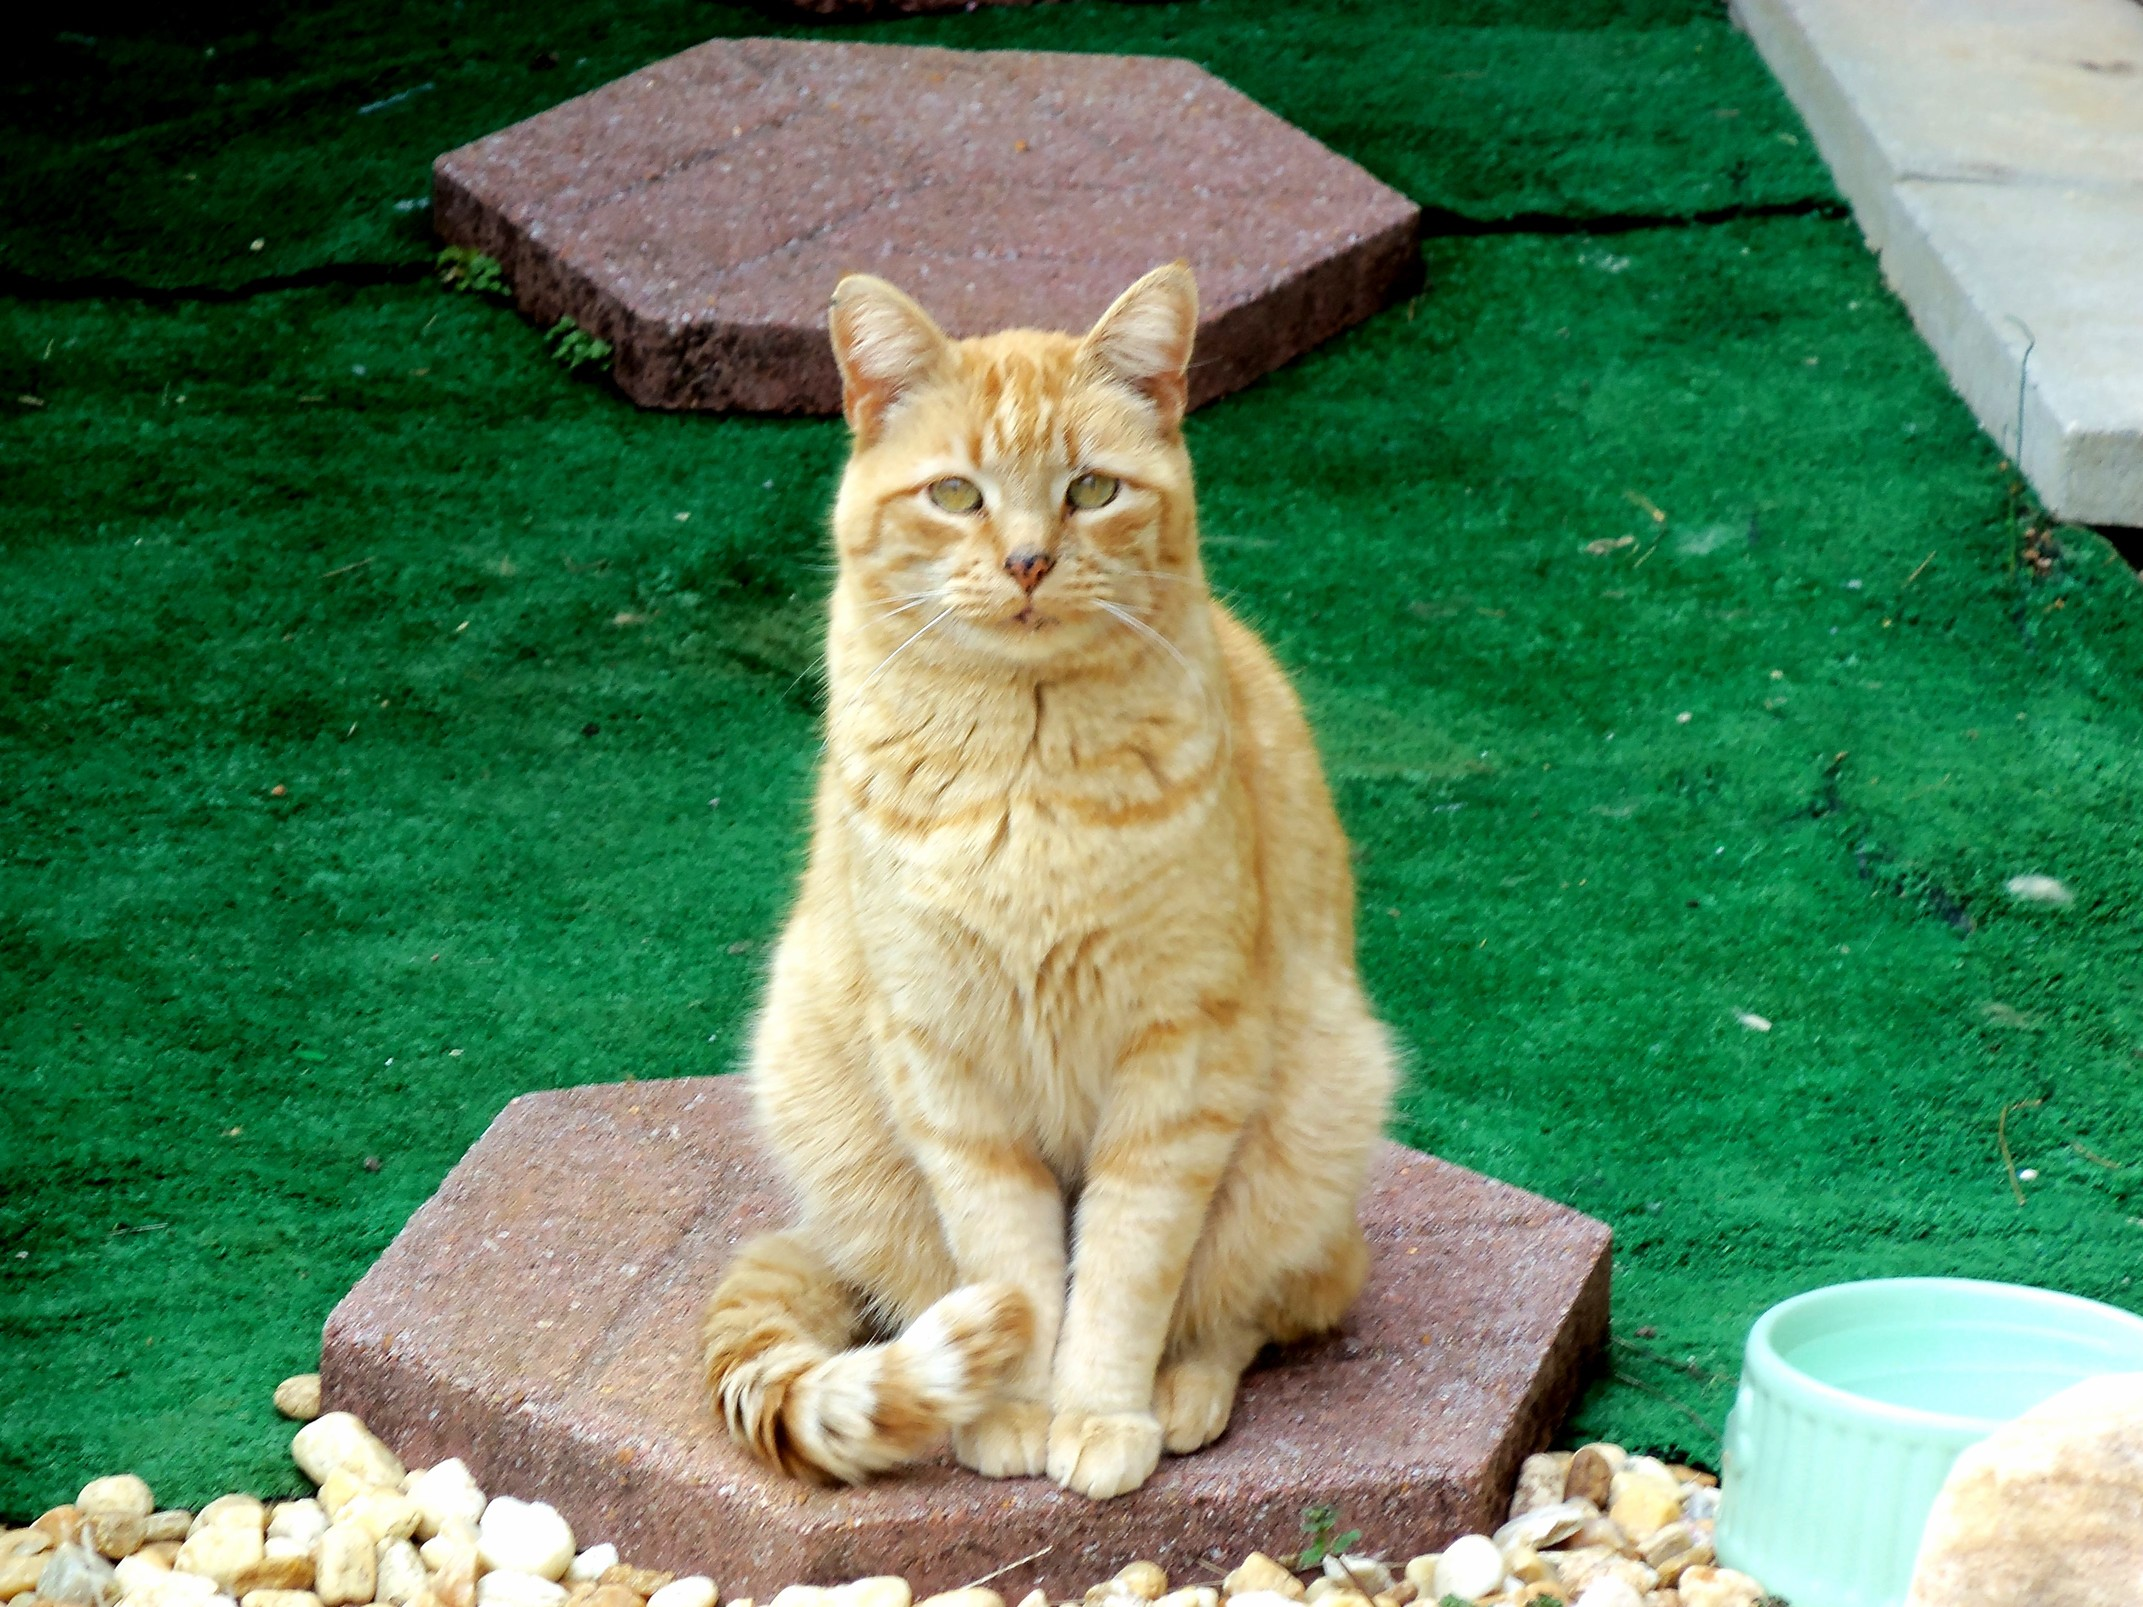 Orange cats you say